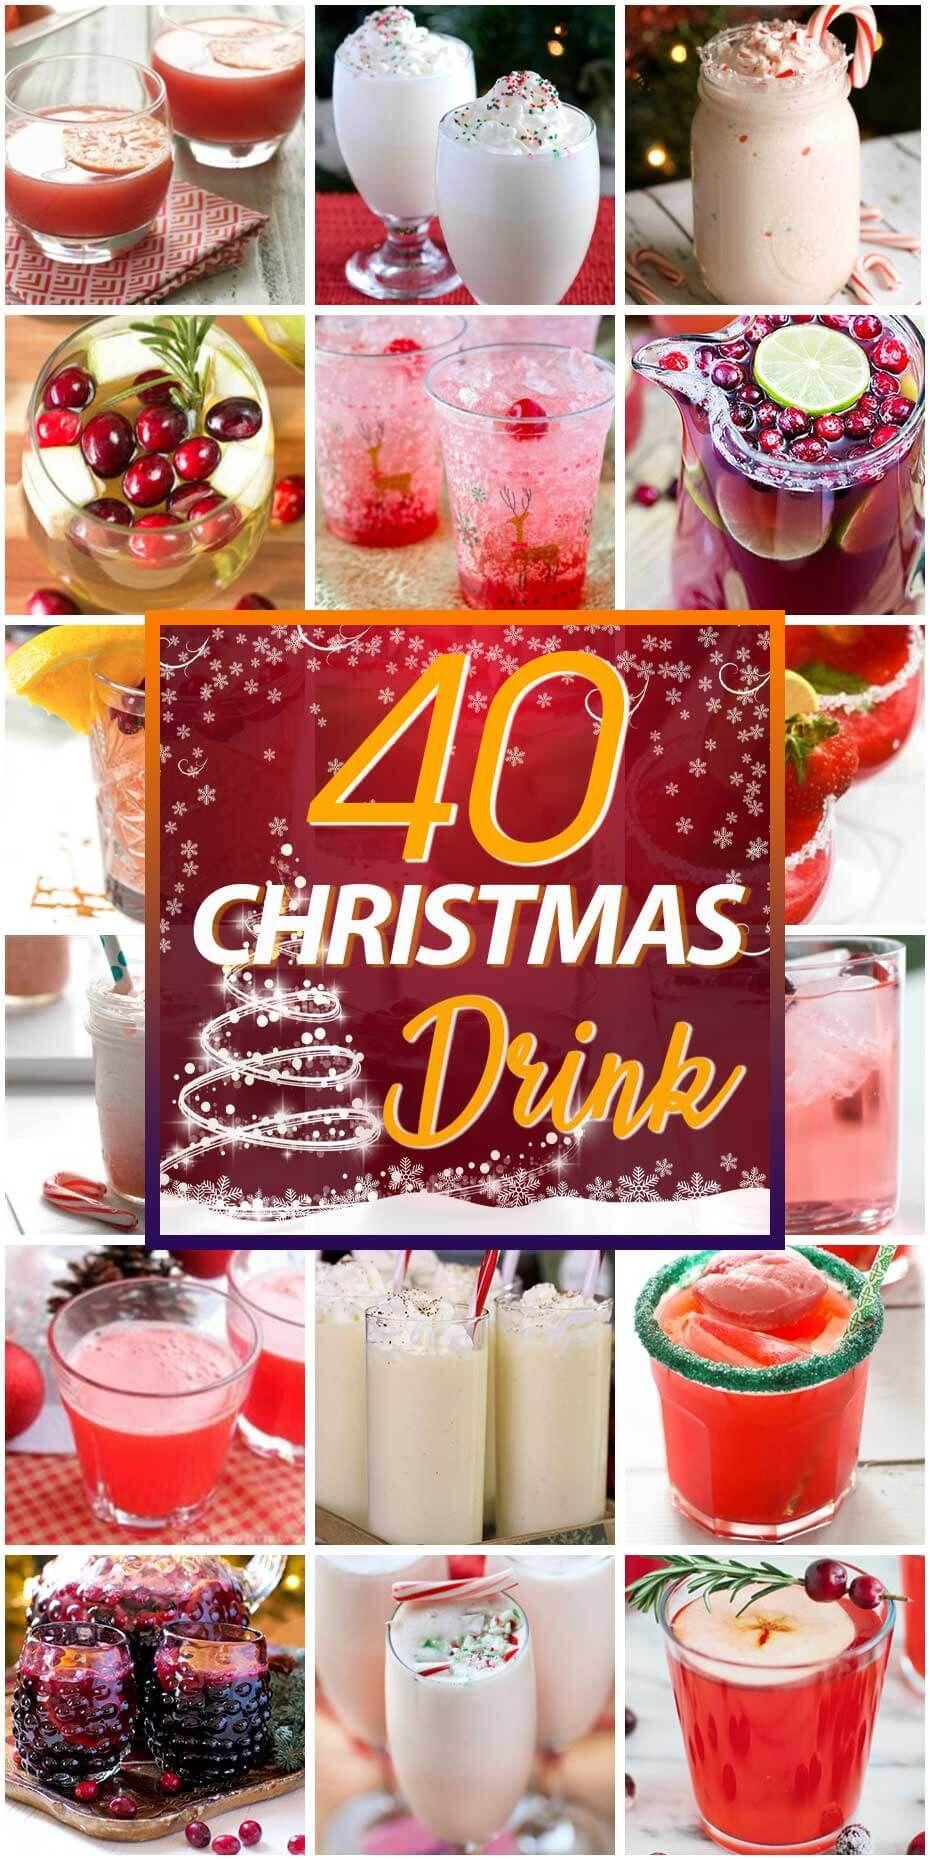 40 Christmas Drink Recipes Christmas Drinks Recipes Christmas Drinks Flavored Drinks